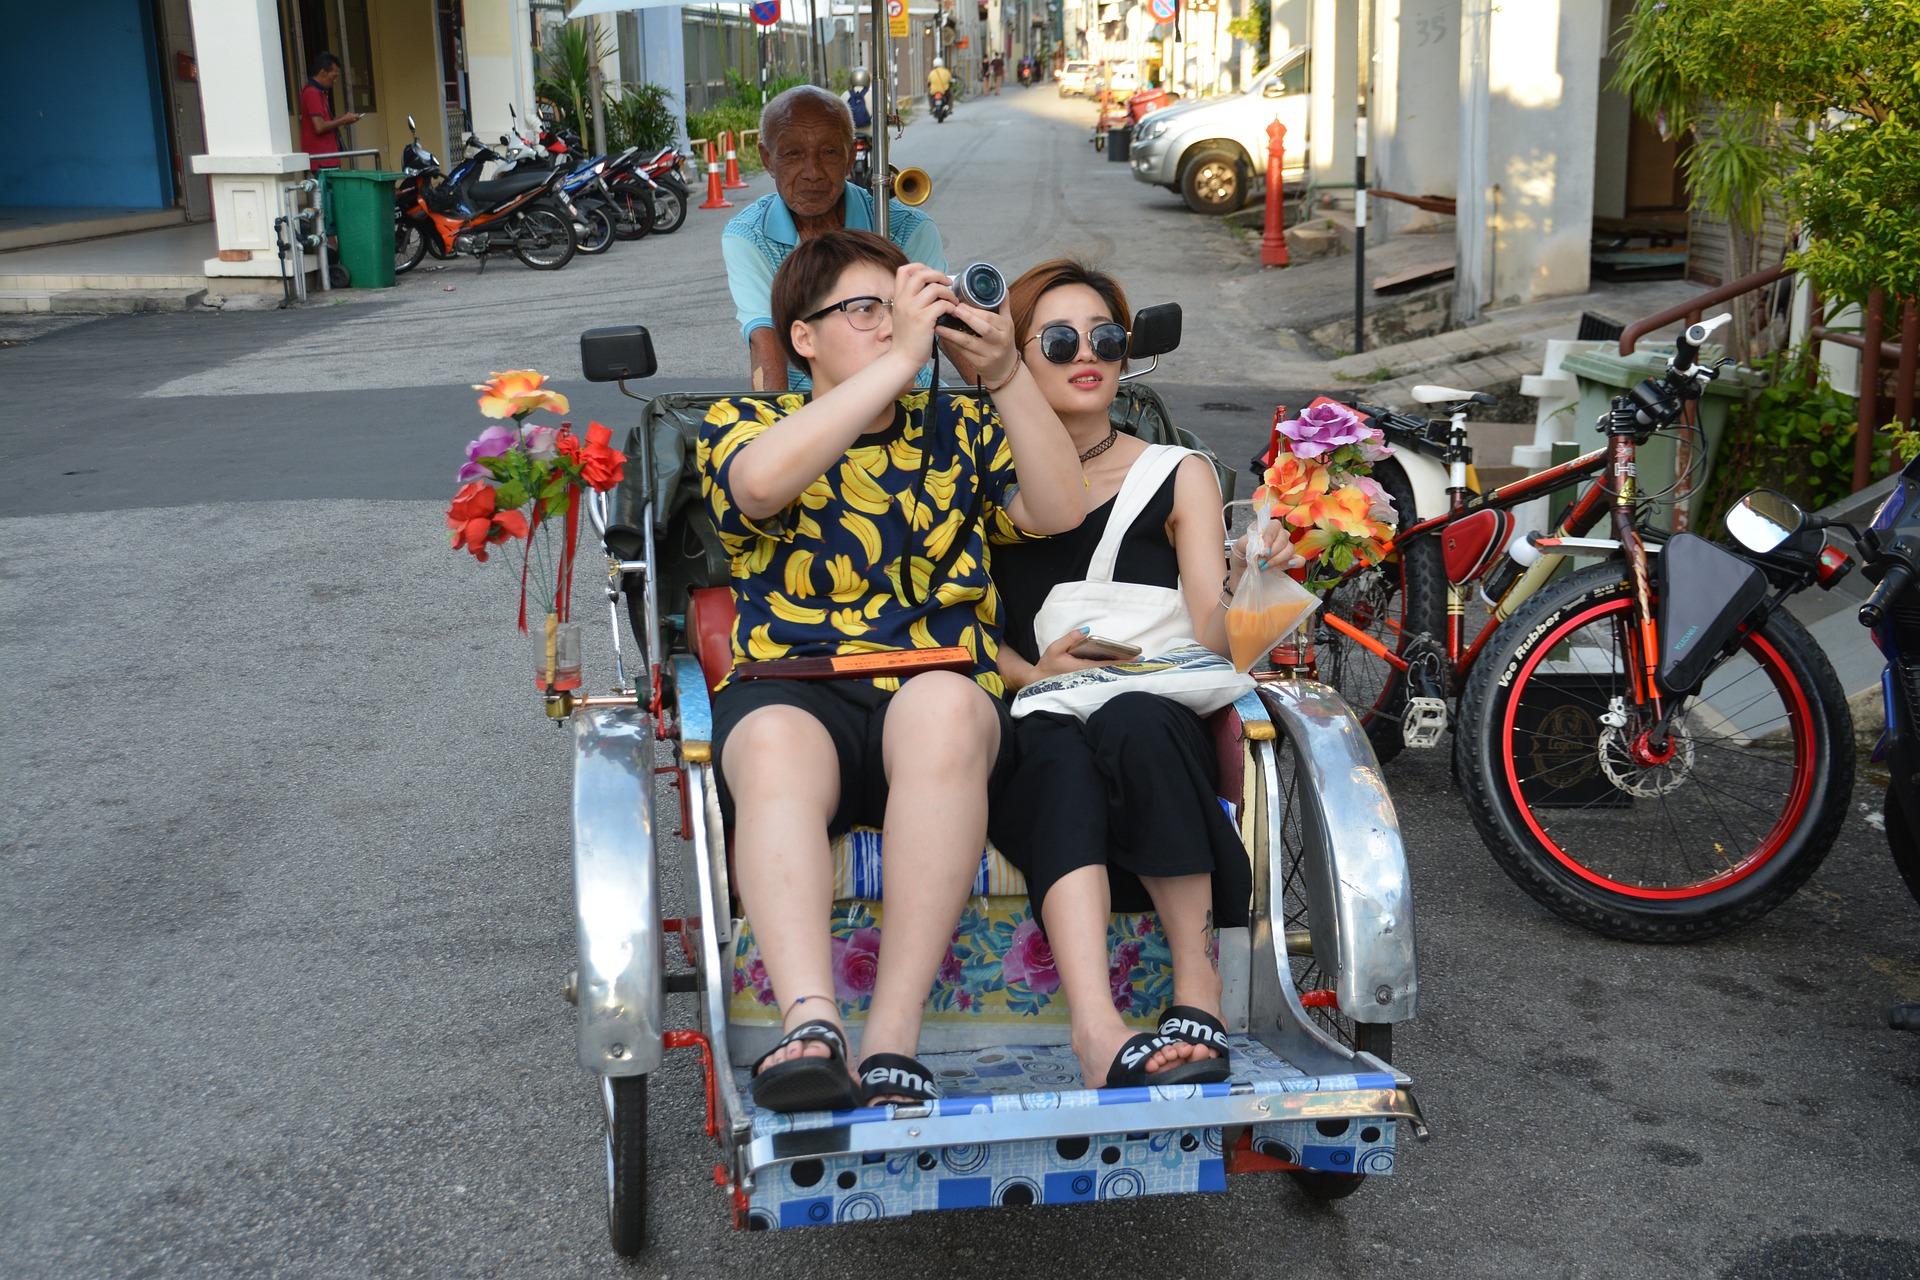 tourists-1432617_1920